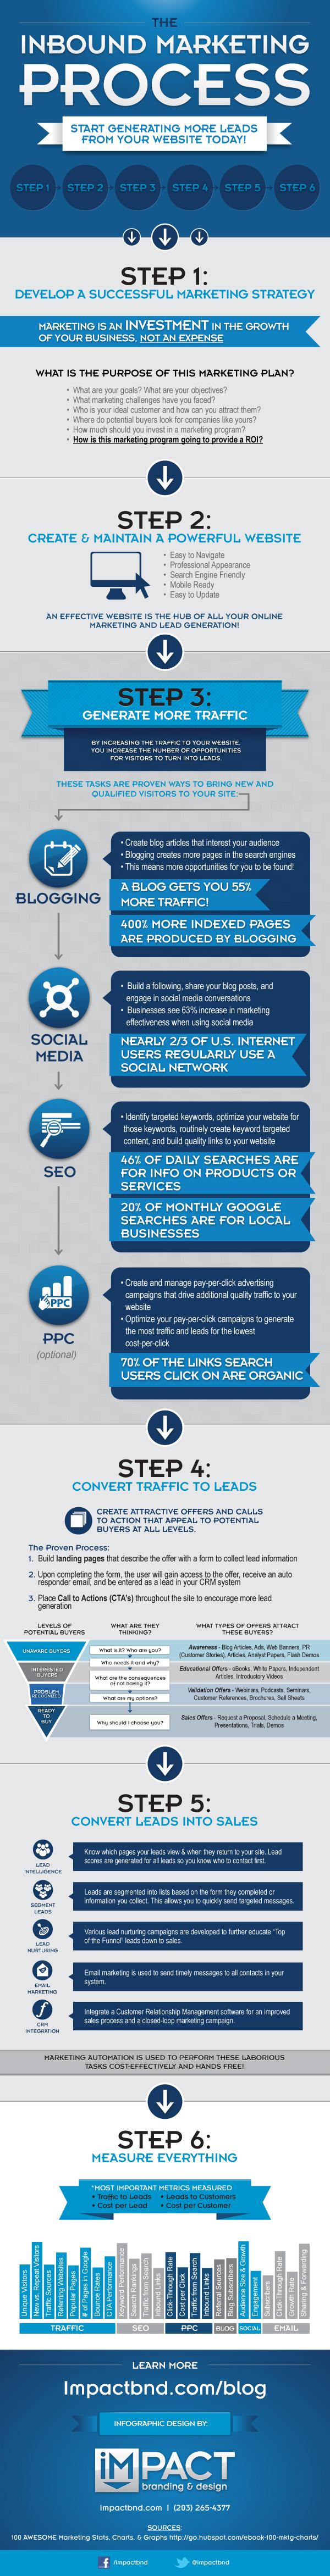 The-Inbound-Marketing-Process-infographic